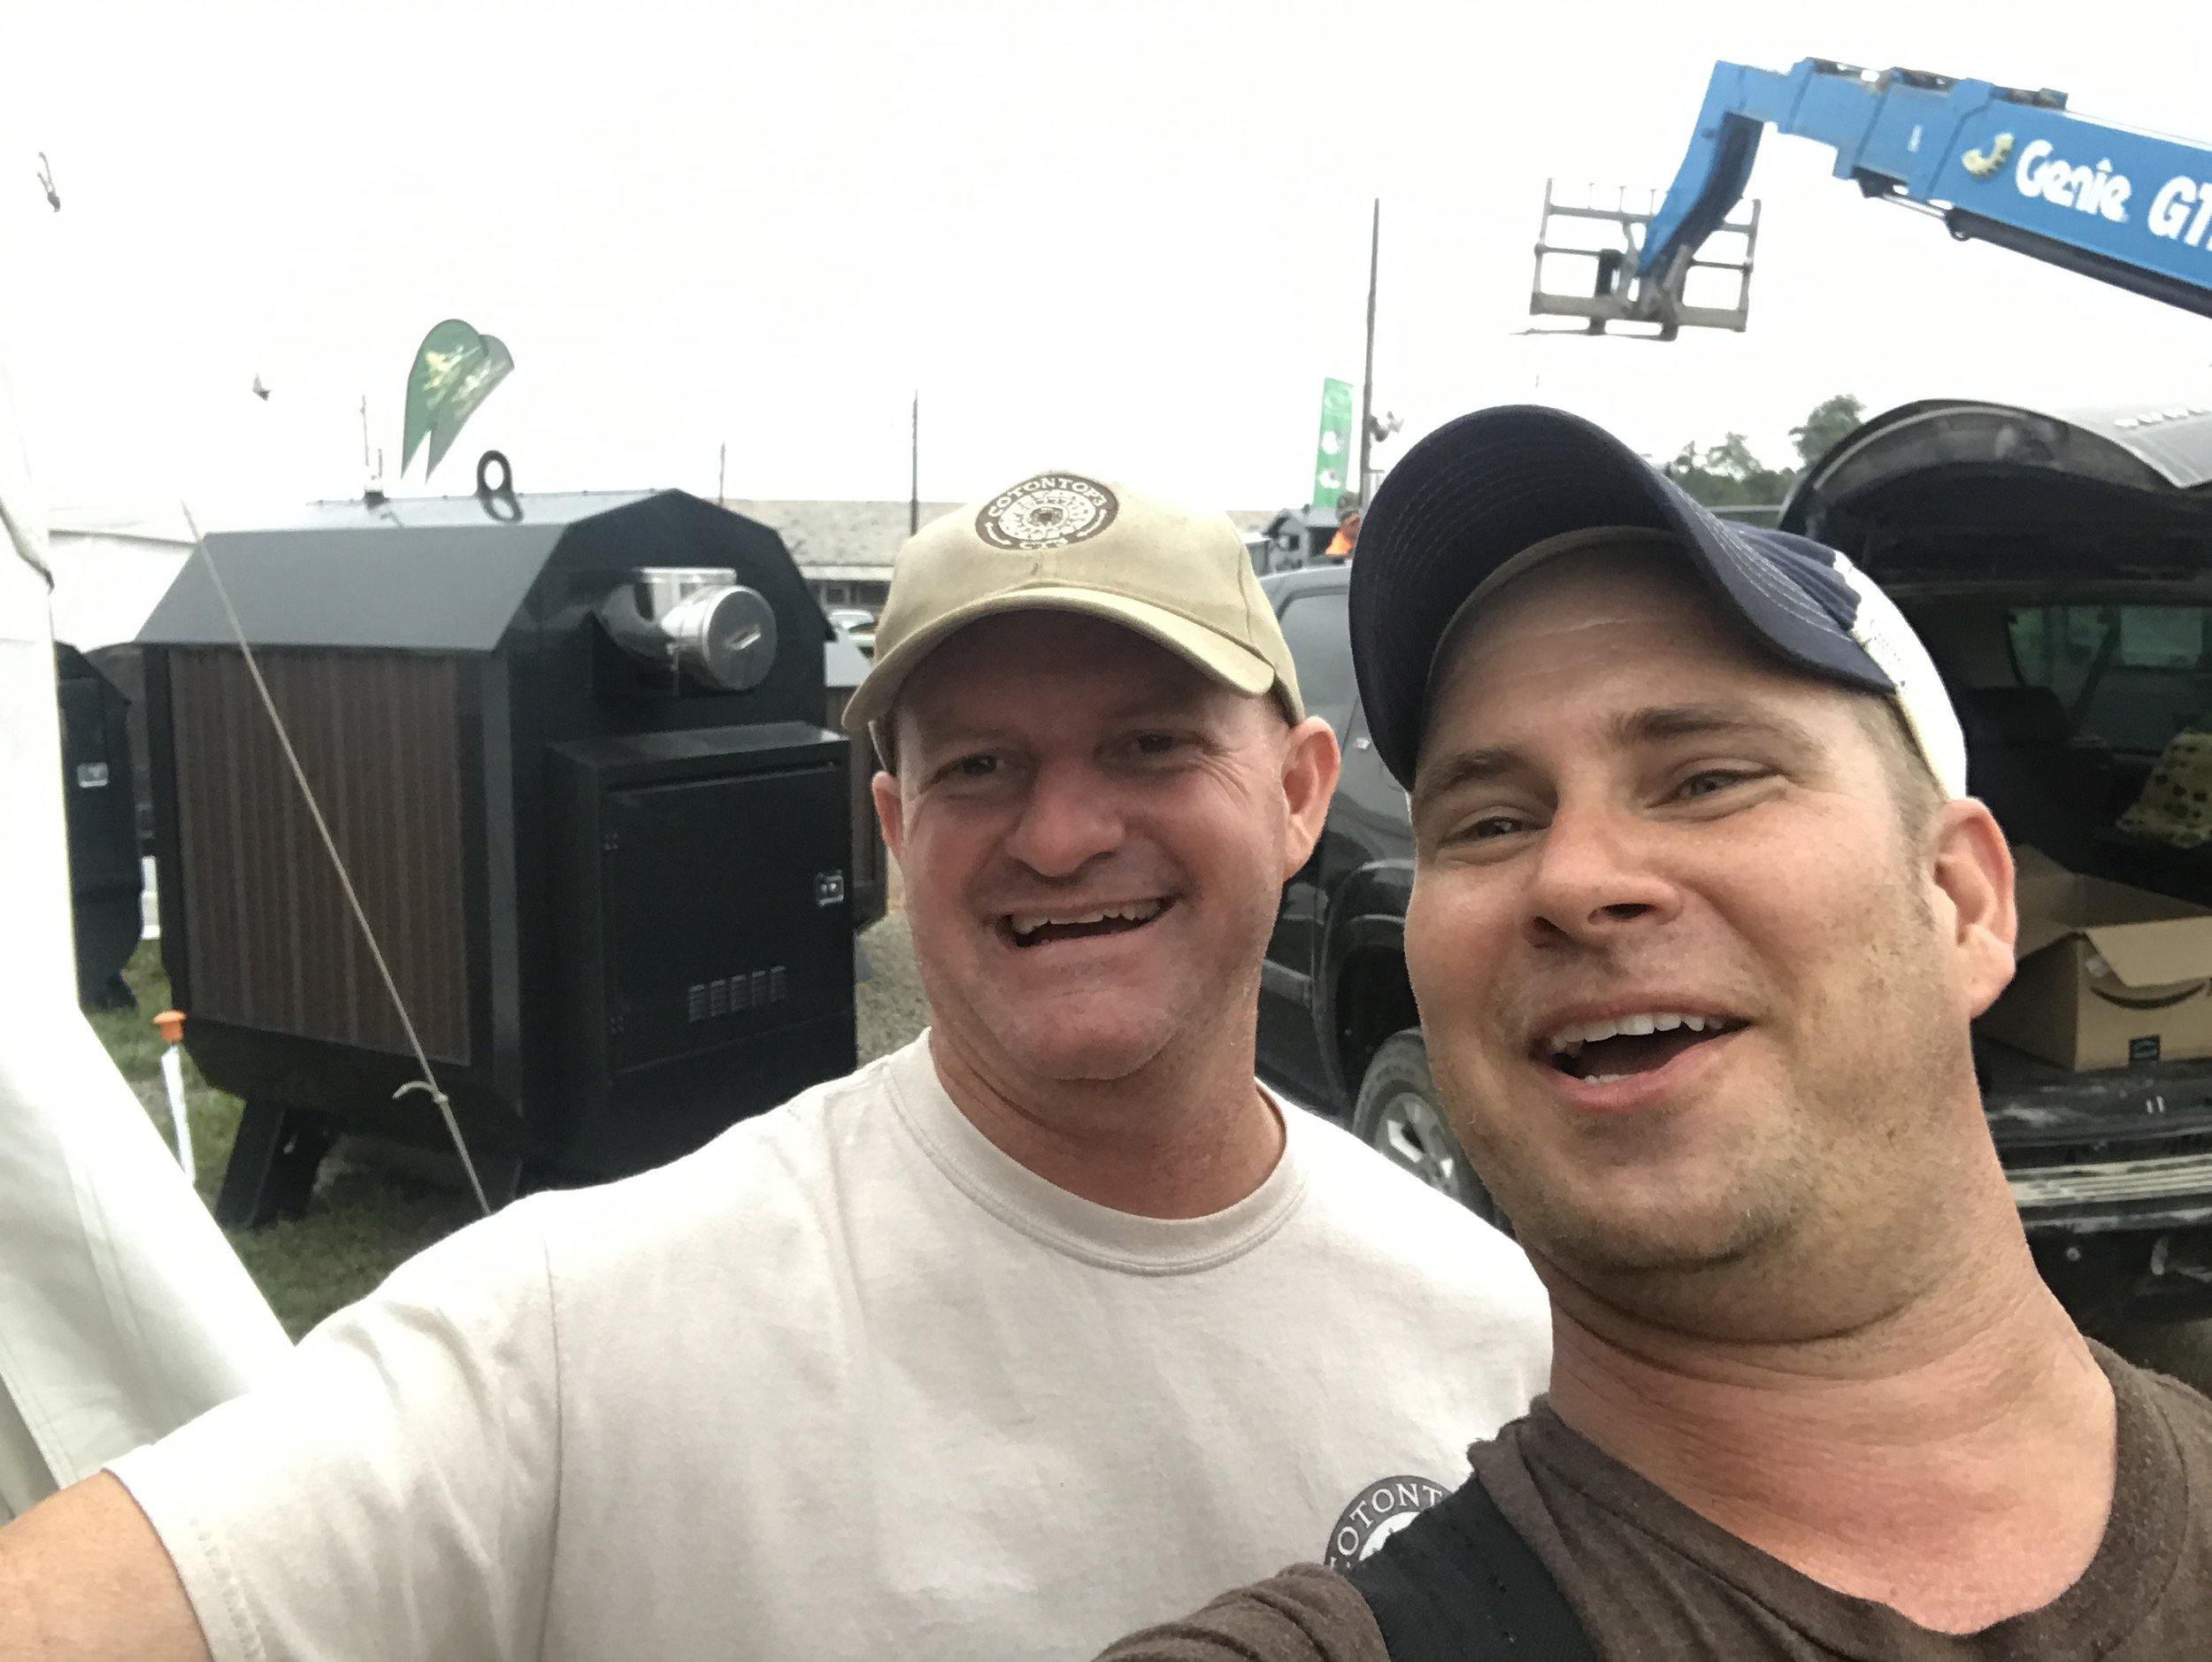 Selfie with Cotontop3